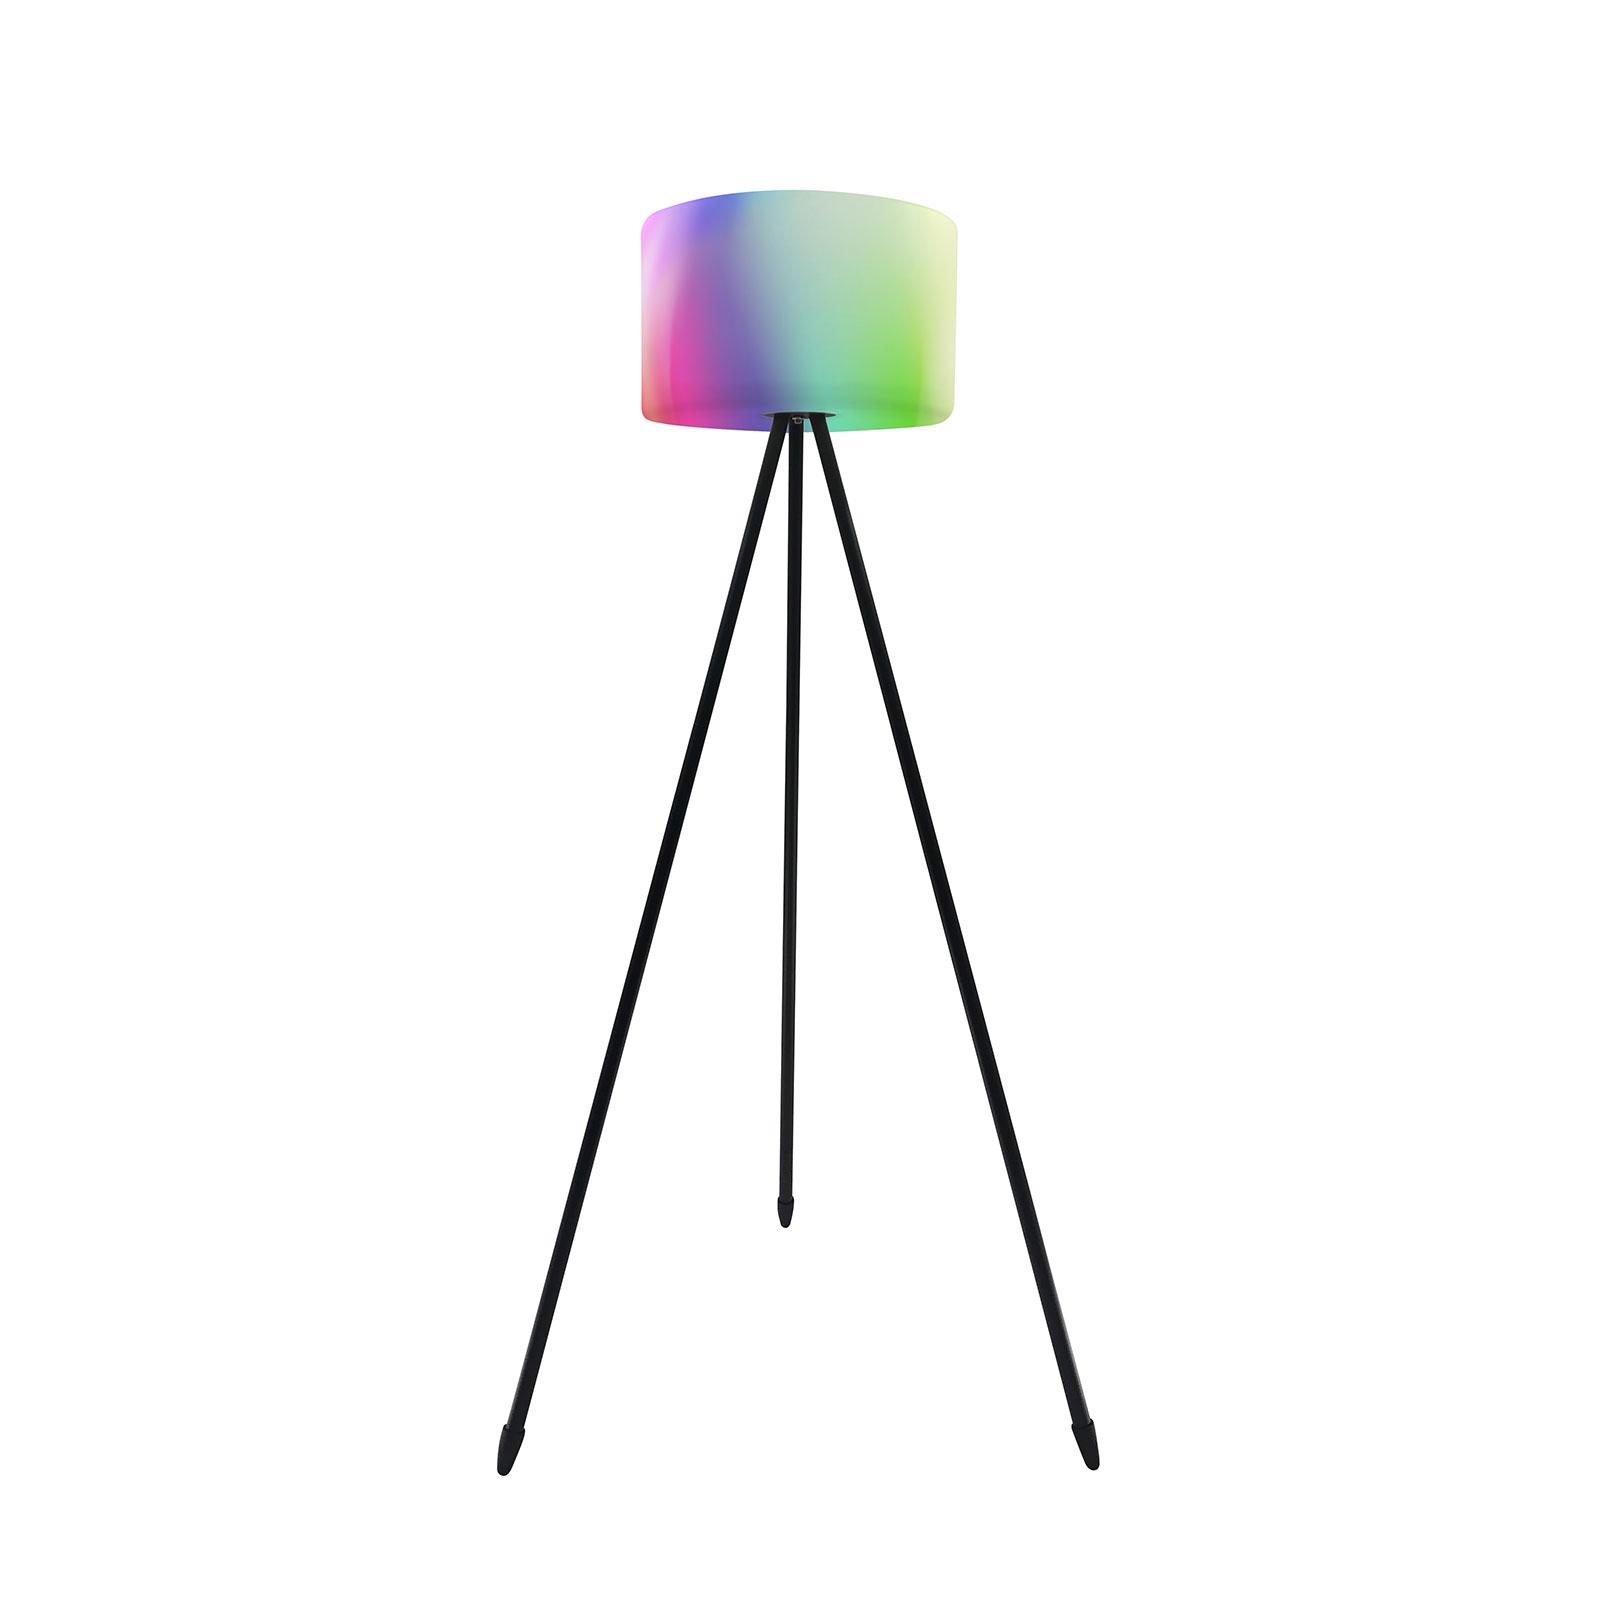 Müller Licht tint Khaya LED-gulvlampe RGBW